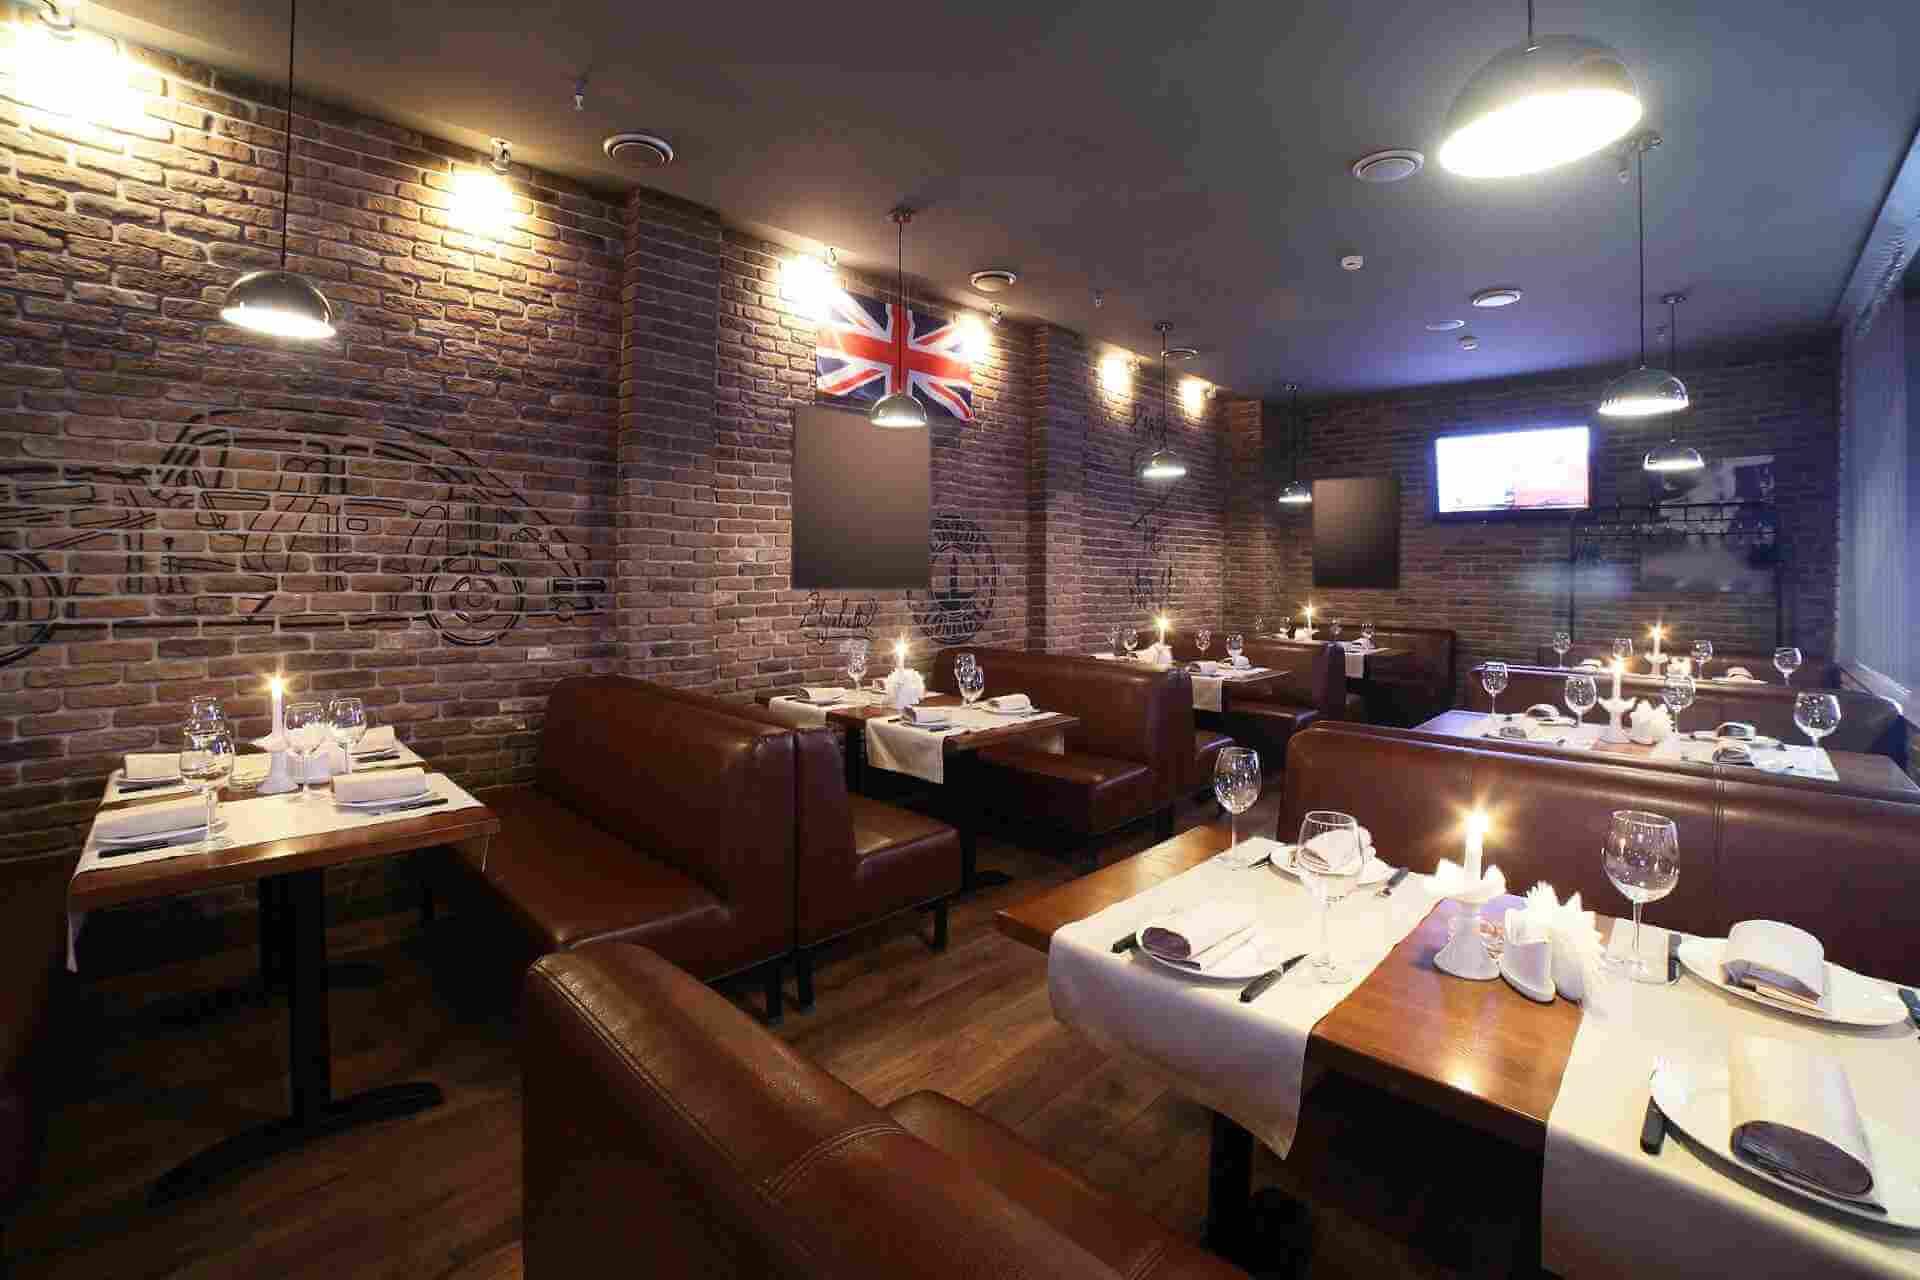 https://restaurantelretiro.com/wp-content/uploads/2016/07/portfolio_08.jpg